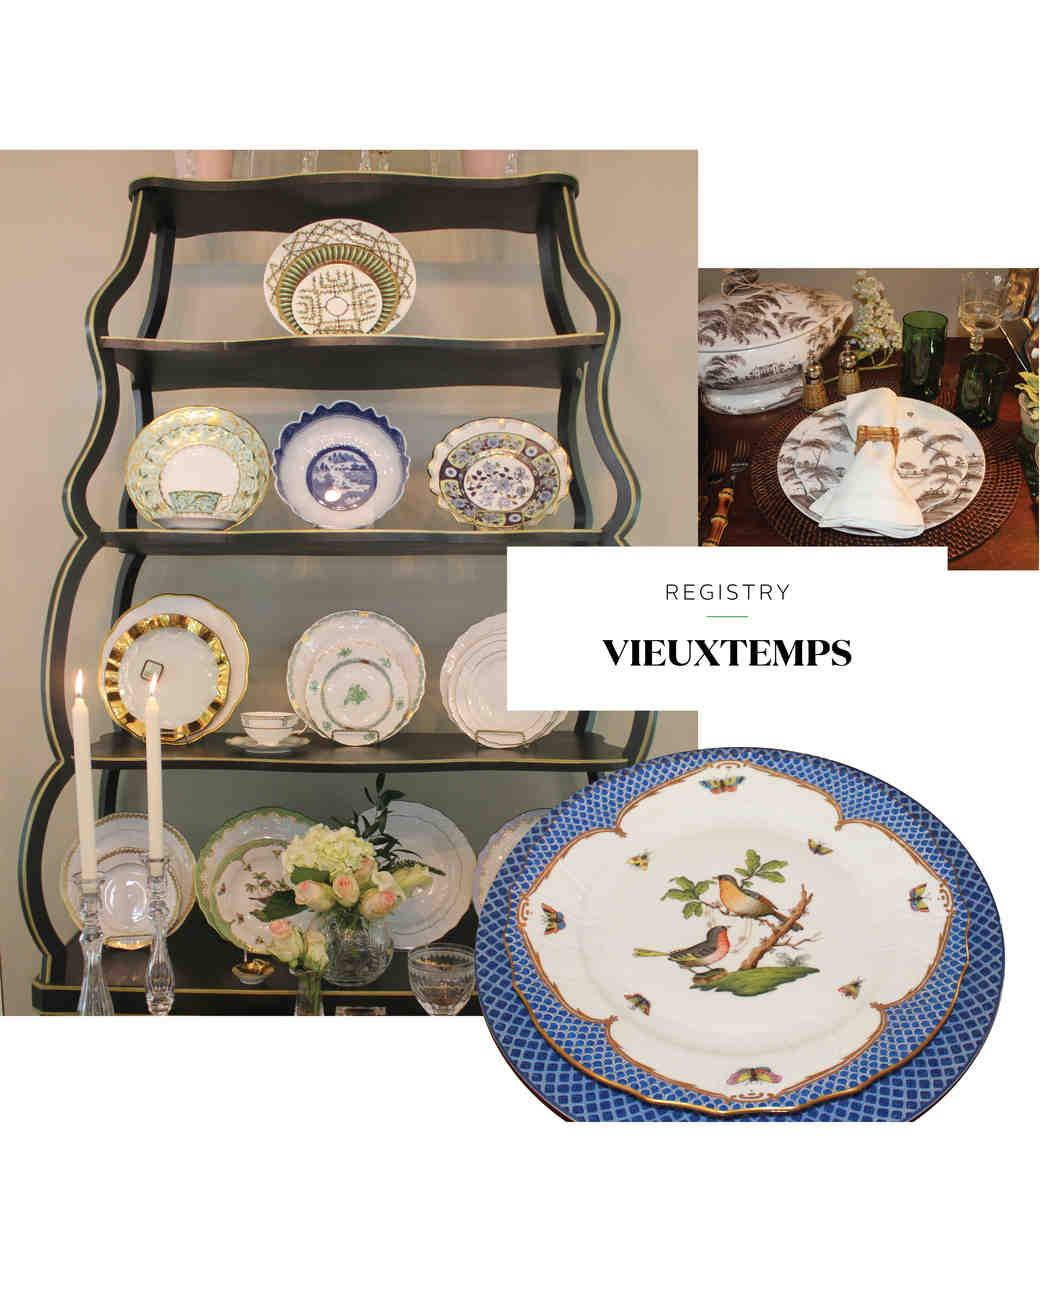 small-business-registry-vieuxtemps-0714.jpg